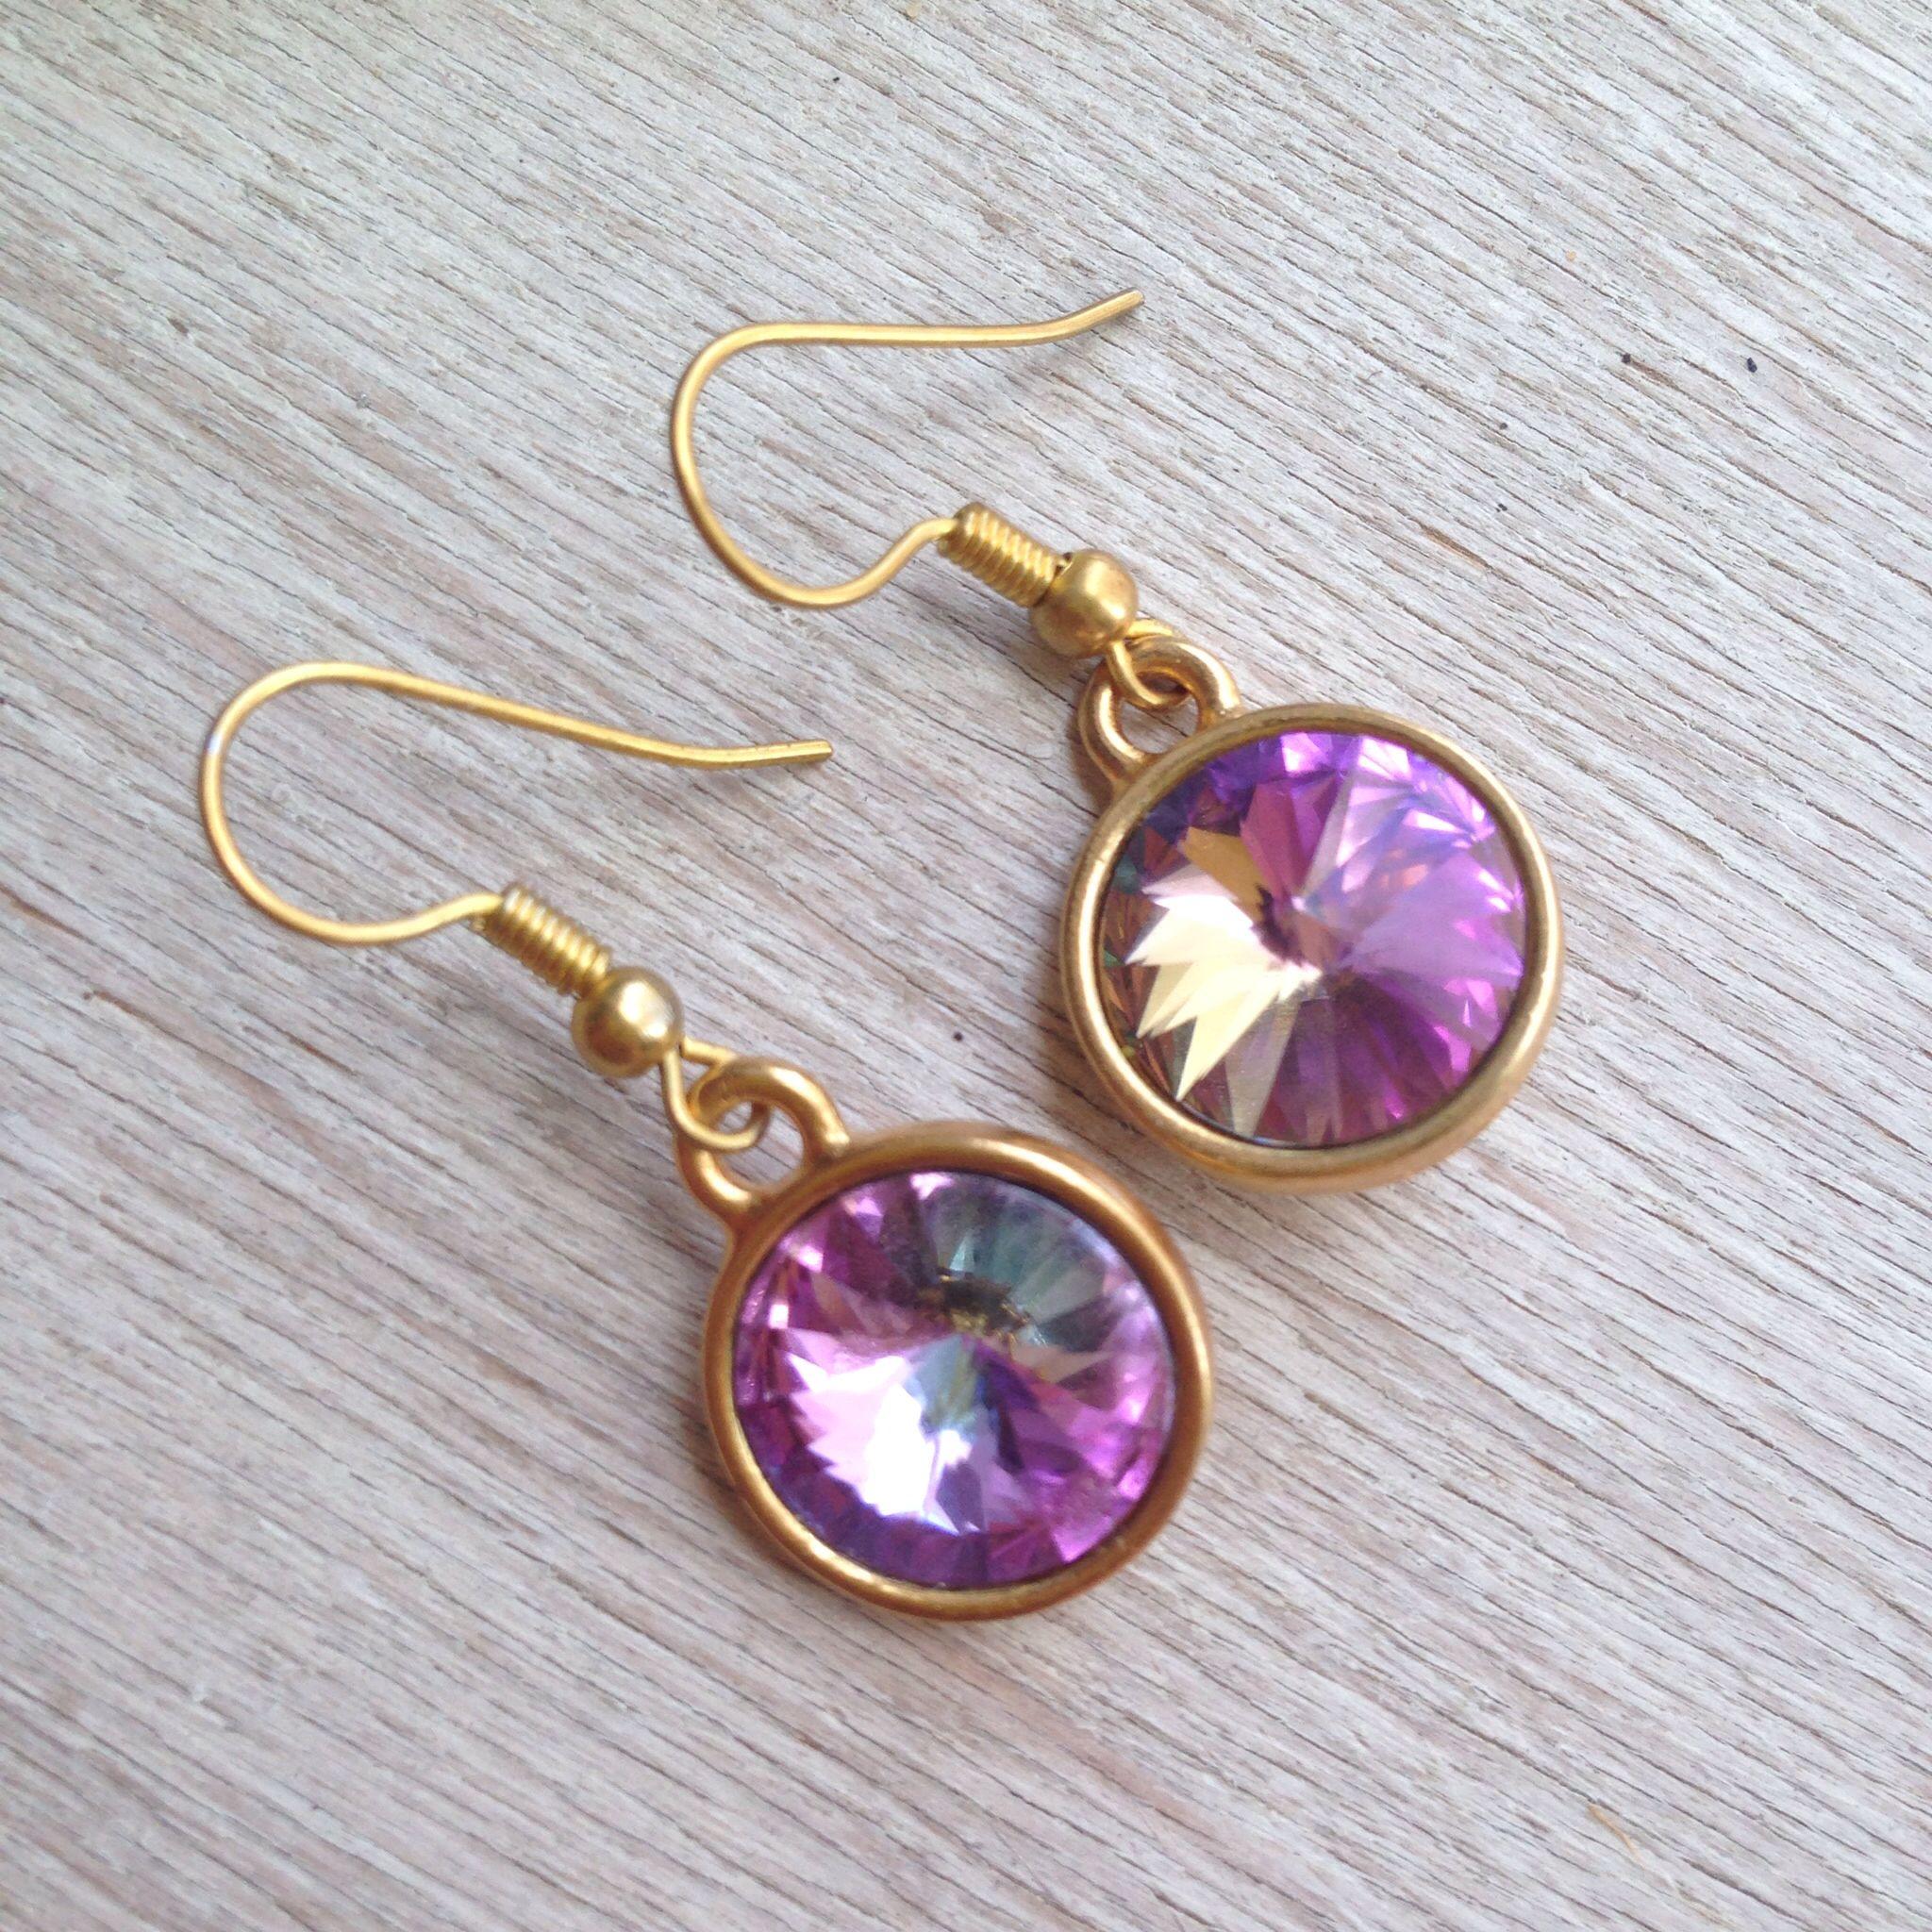 Earrings with Rivoli crystals